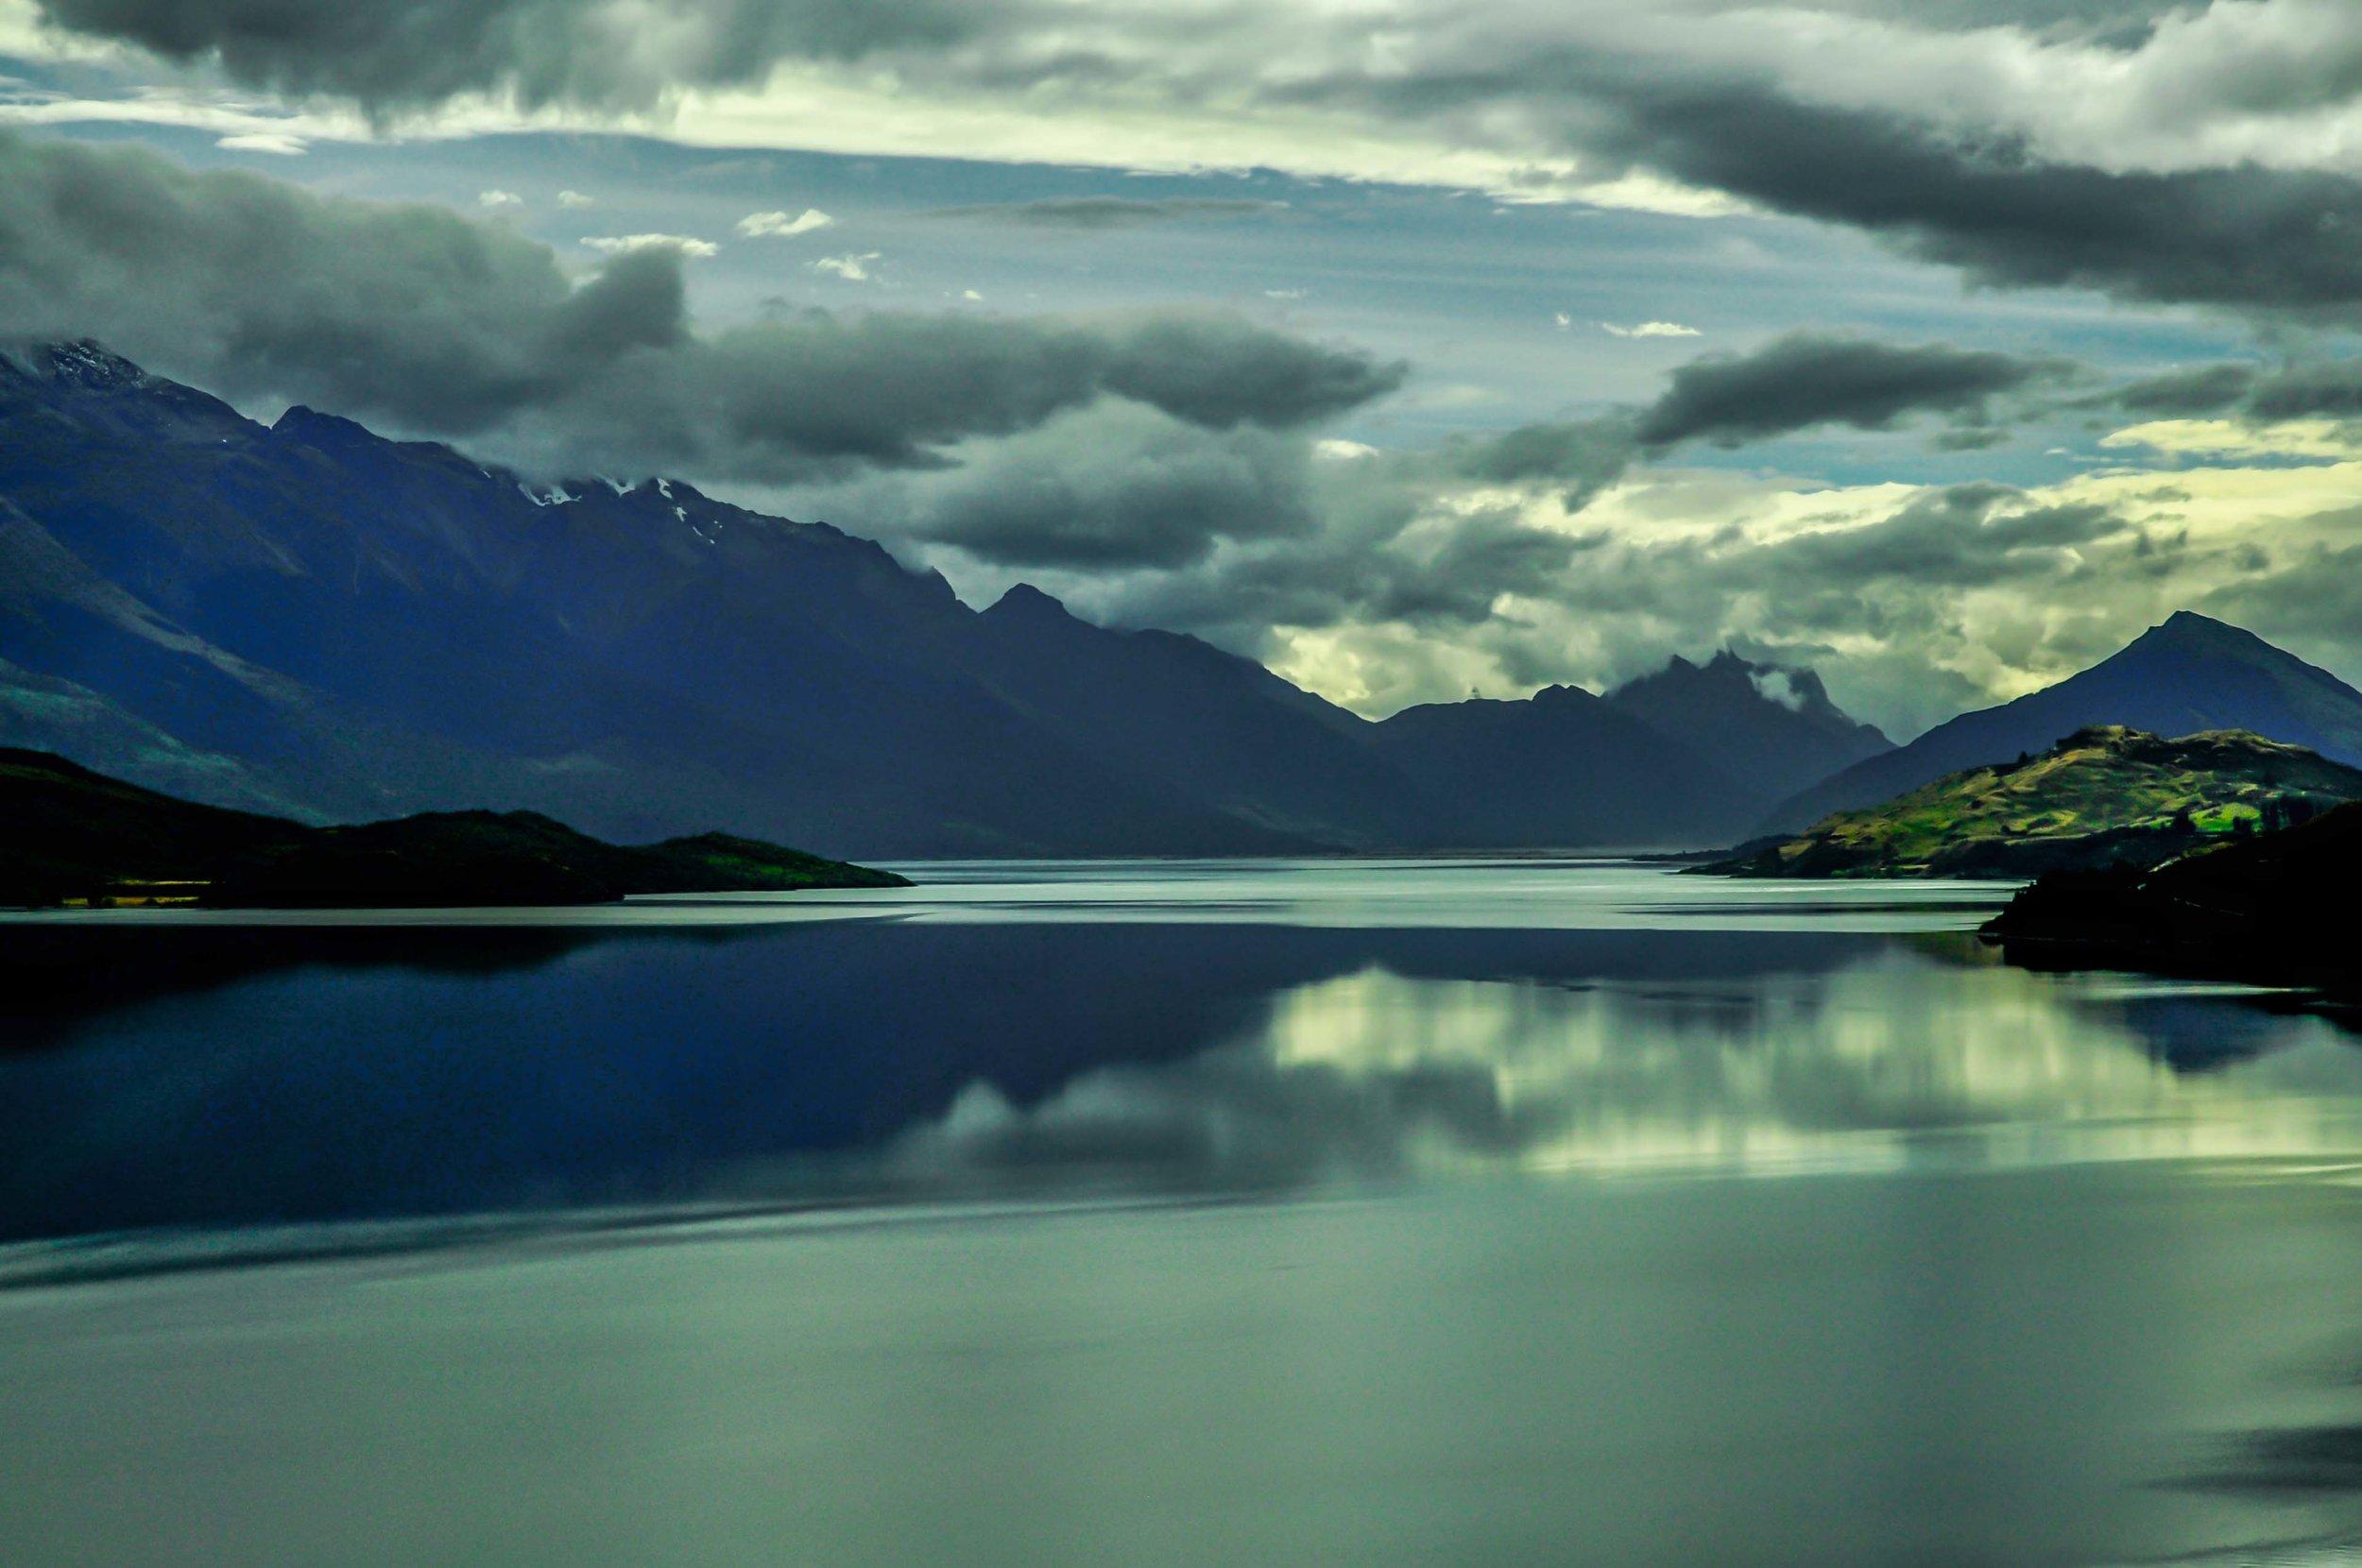 Dart River. Blanket Bay, New Zealand 2010